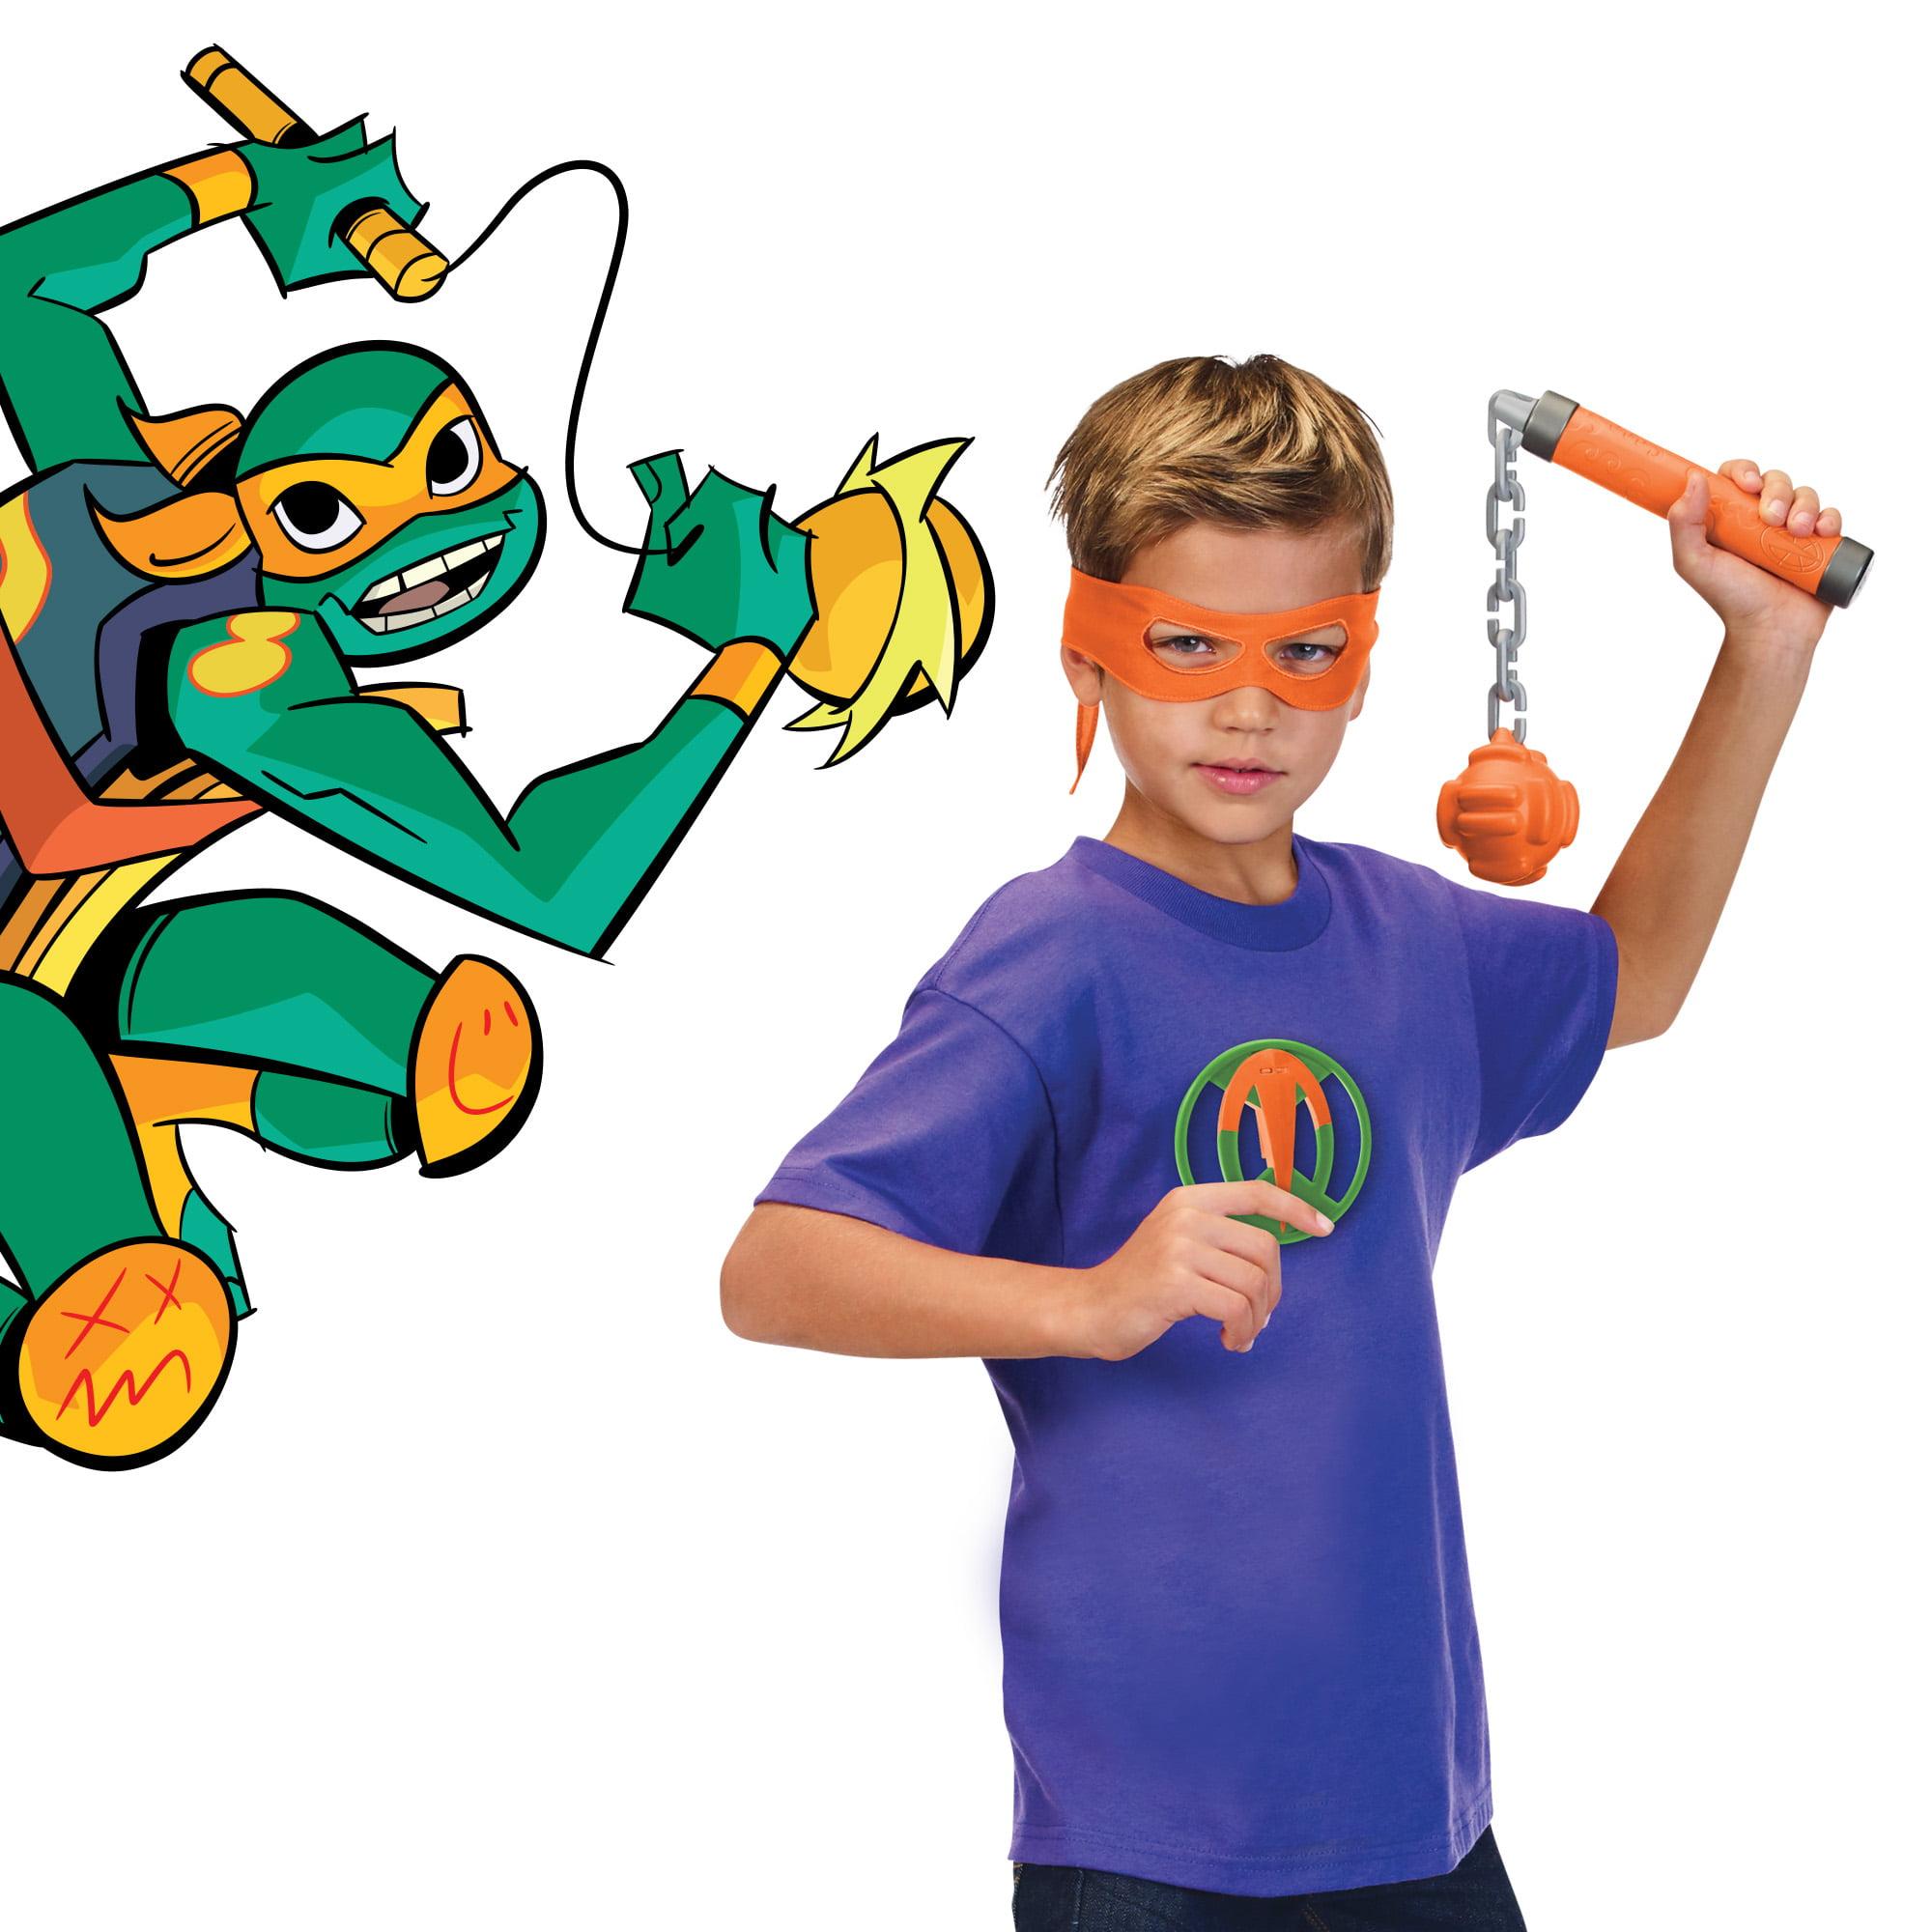 Rise of the Teenage Mutant Ninja Turtles Michaelangelo's Kusarifundo Role Play